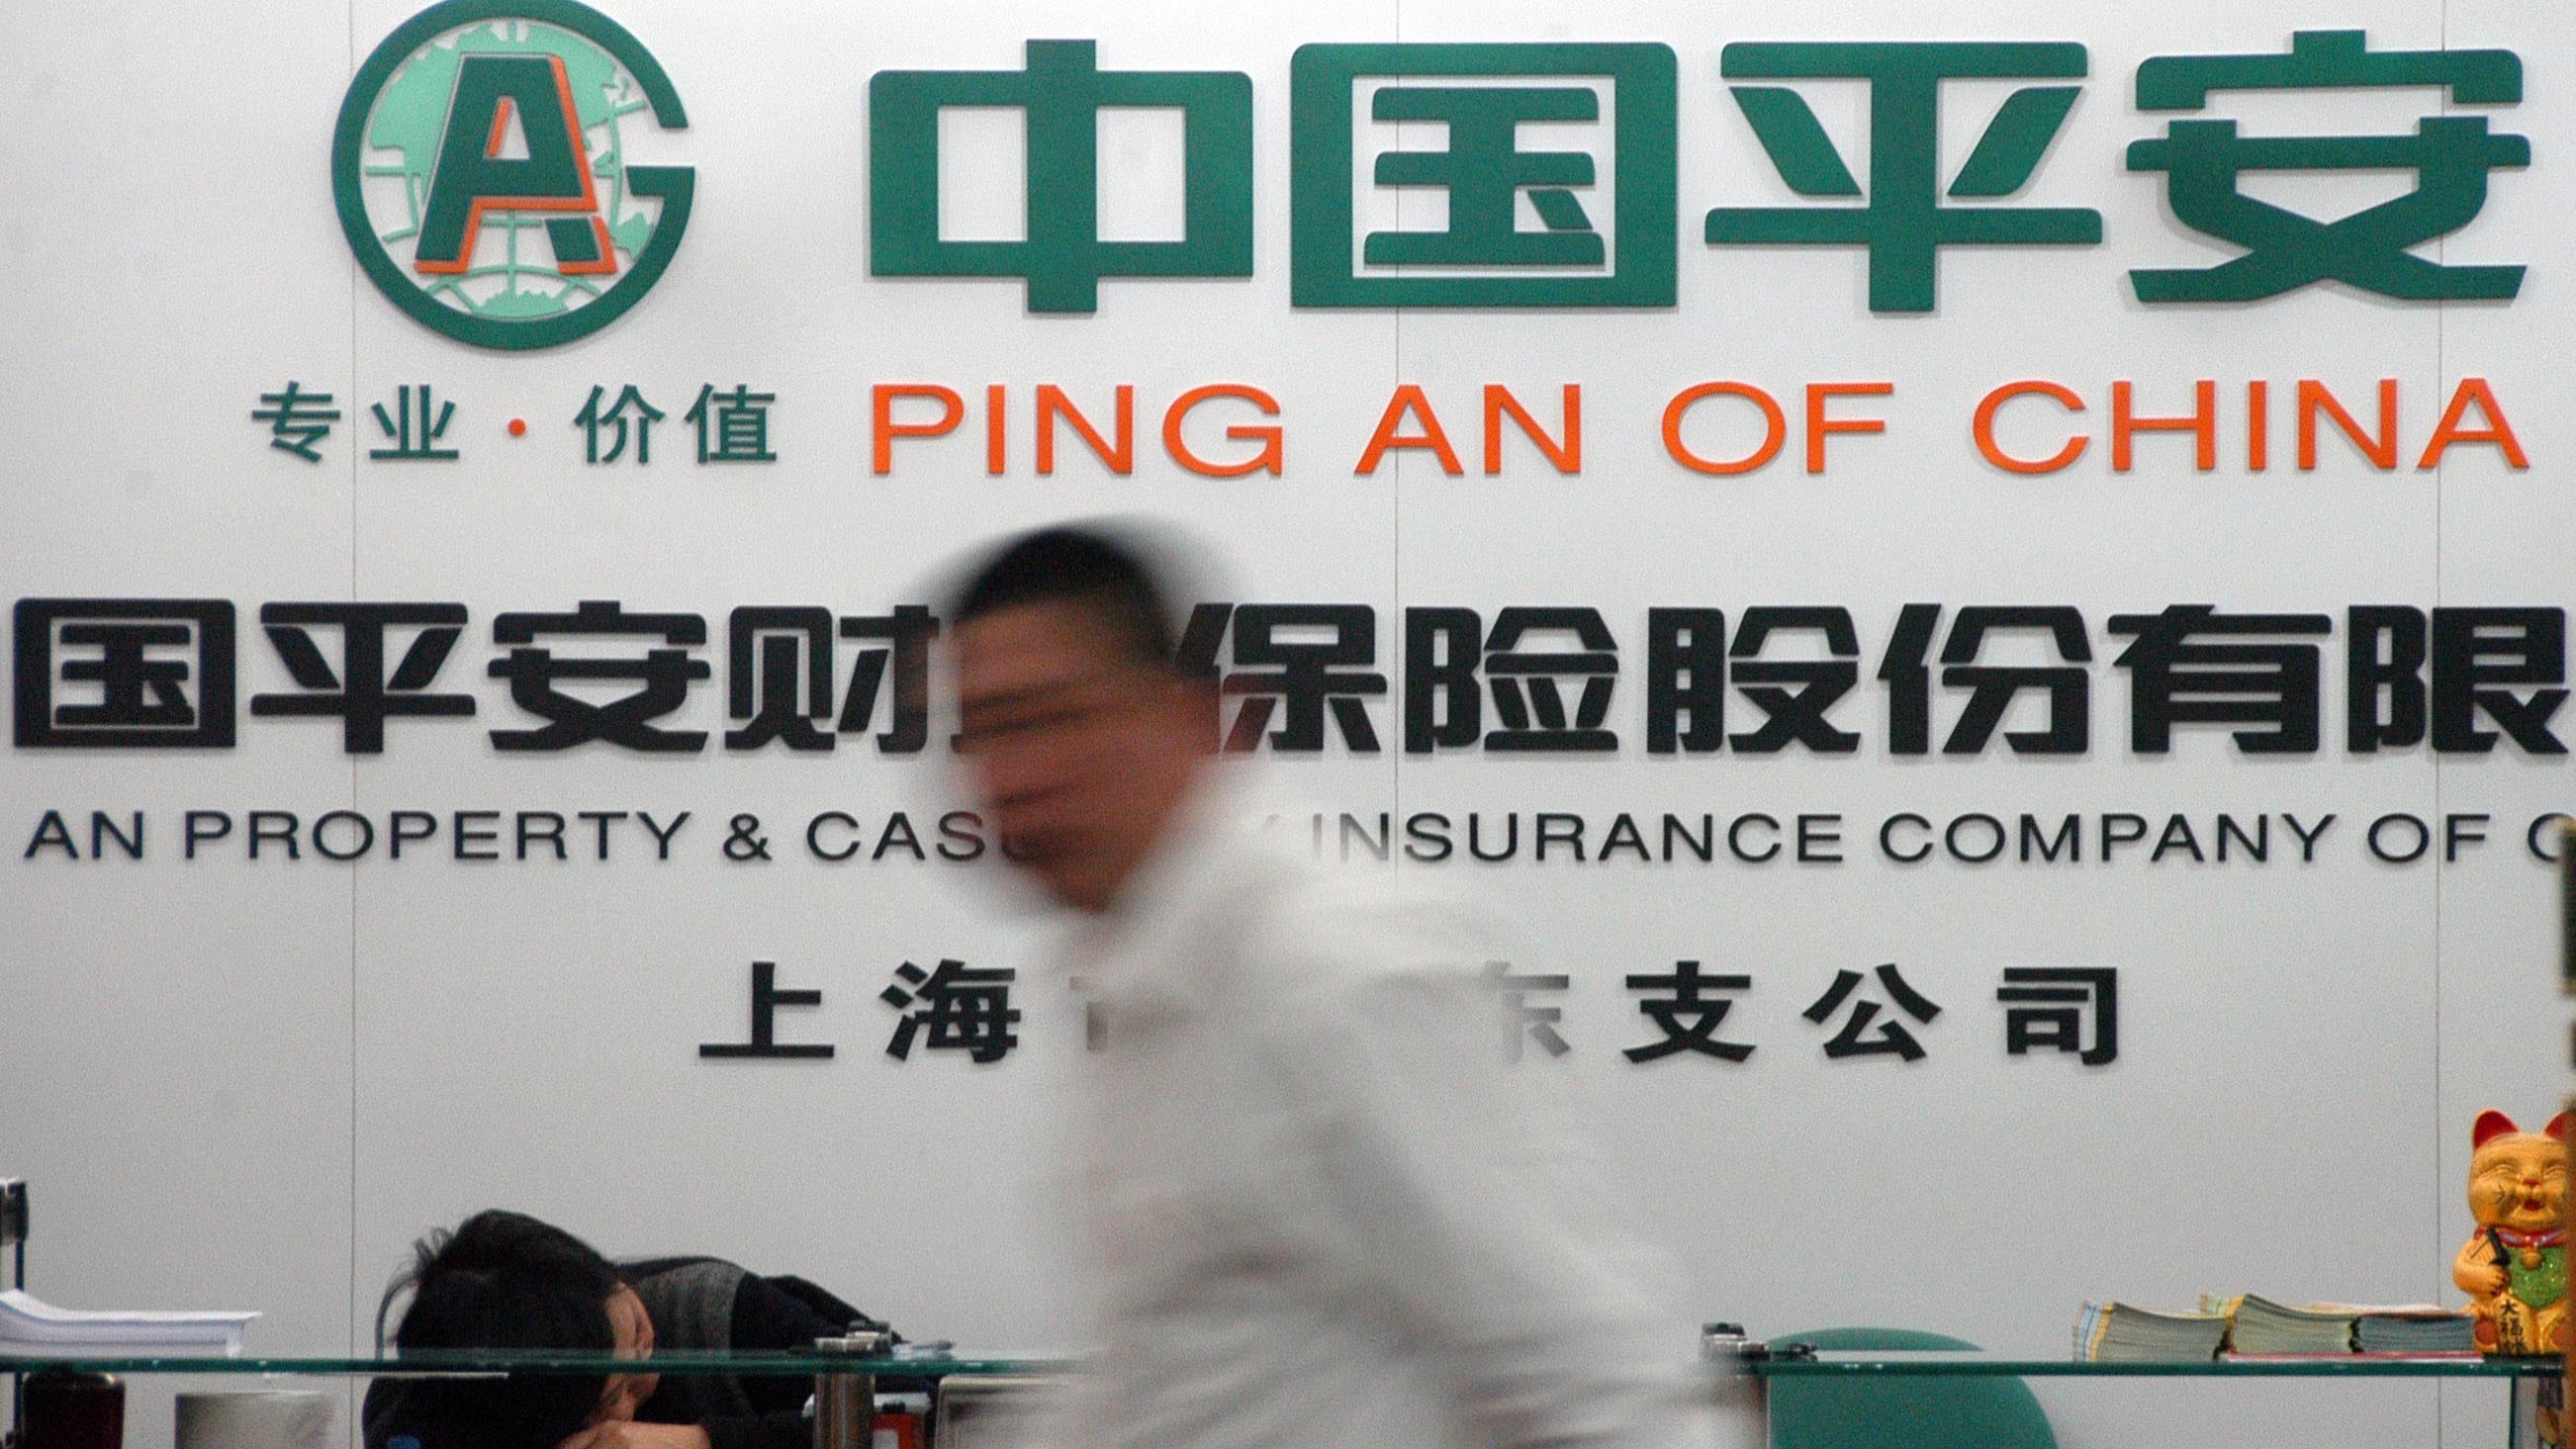 Chinesa Ping An é a marca de seguros mais valiosa do mundo